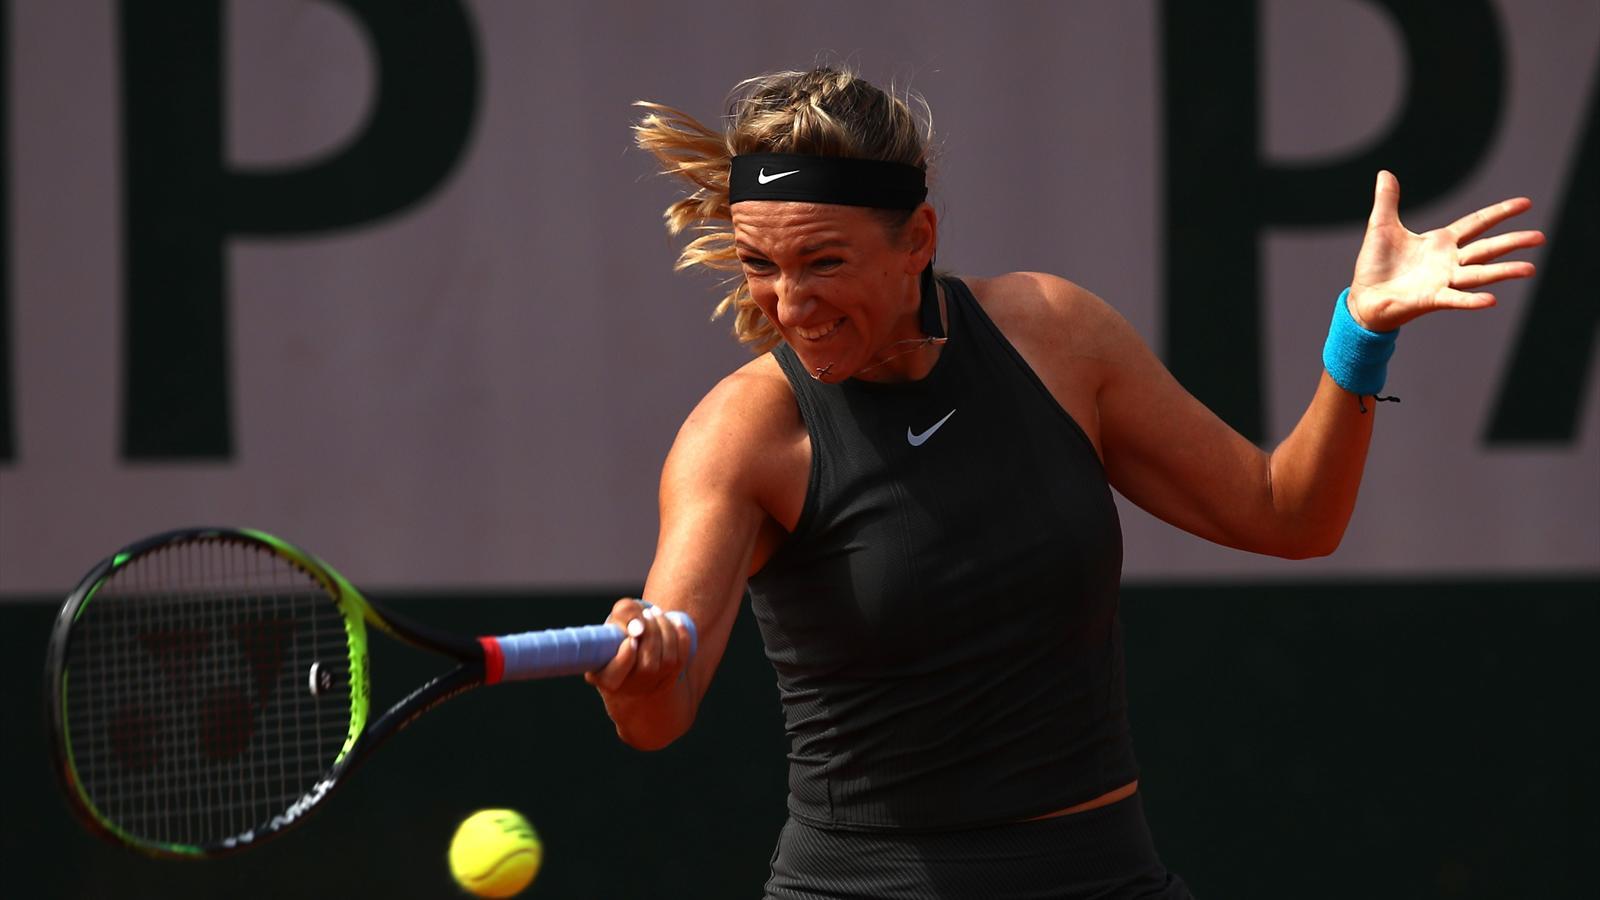 WTA, US Open: Виктория Азаренко — Екатерина Макарова